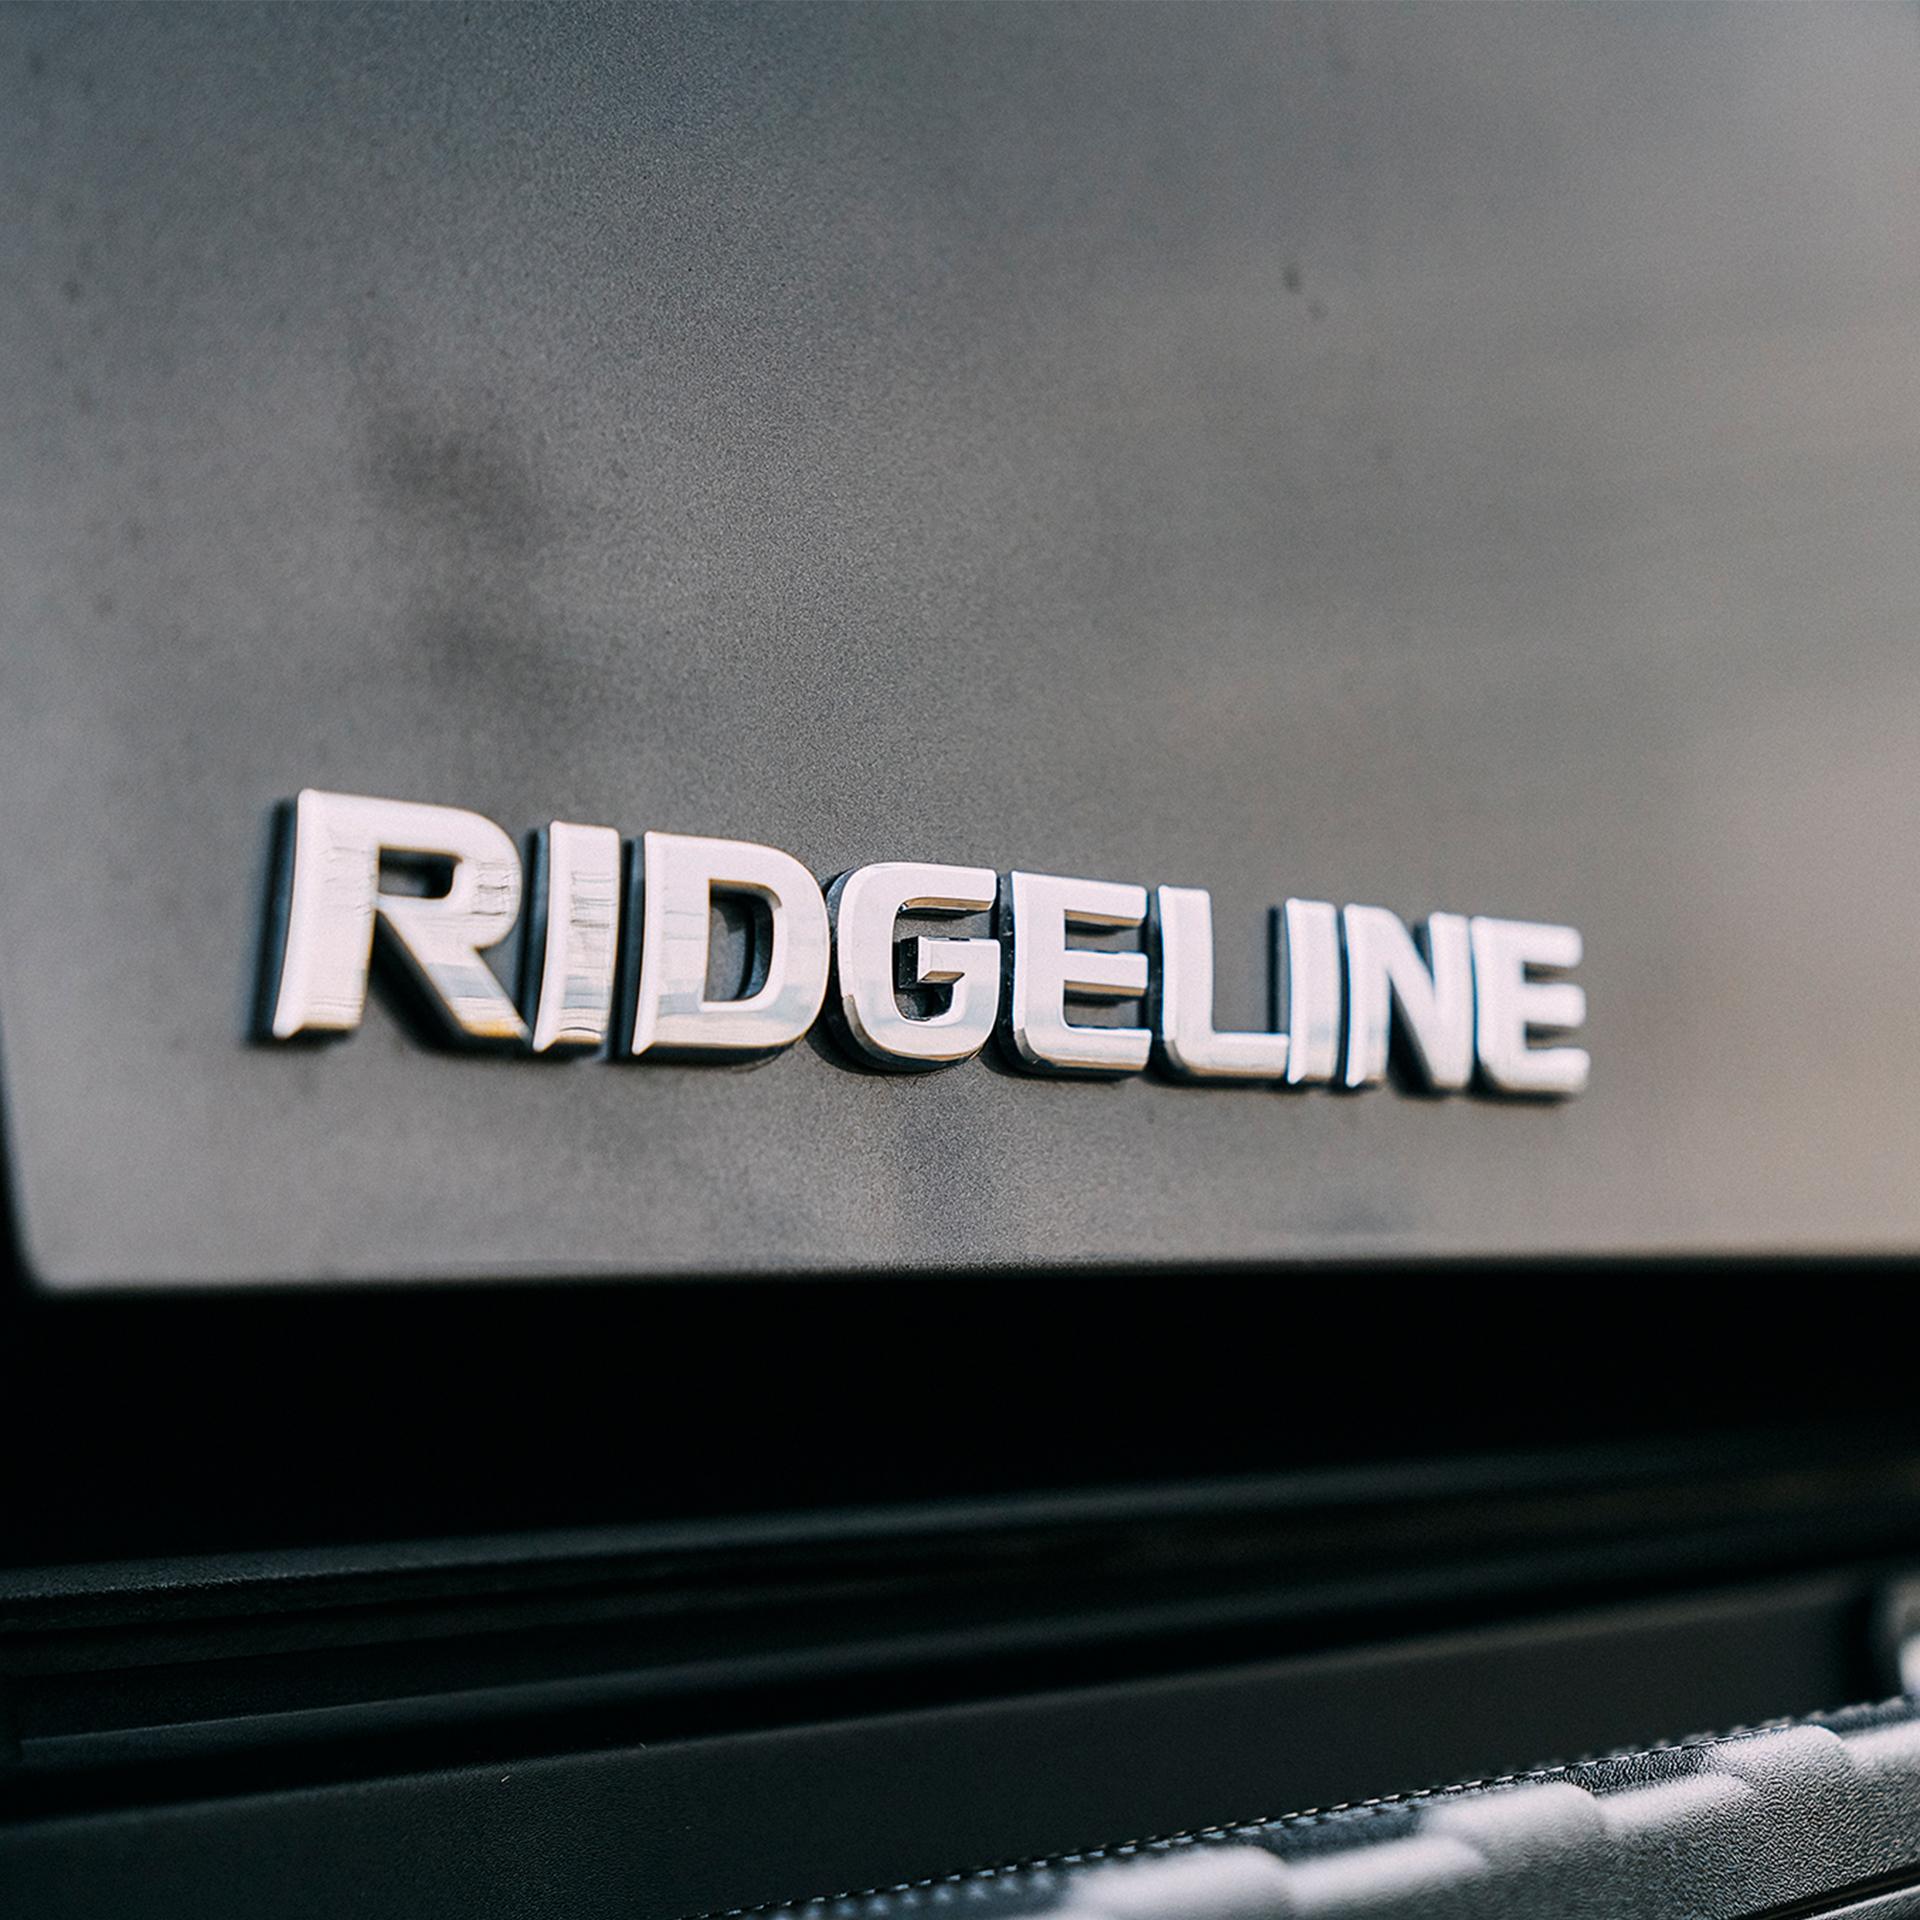 Ridgeline (Honda)